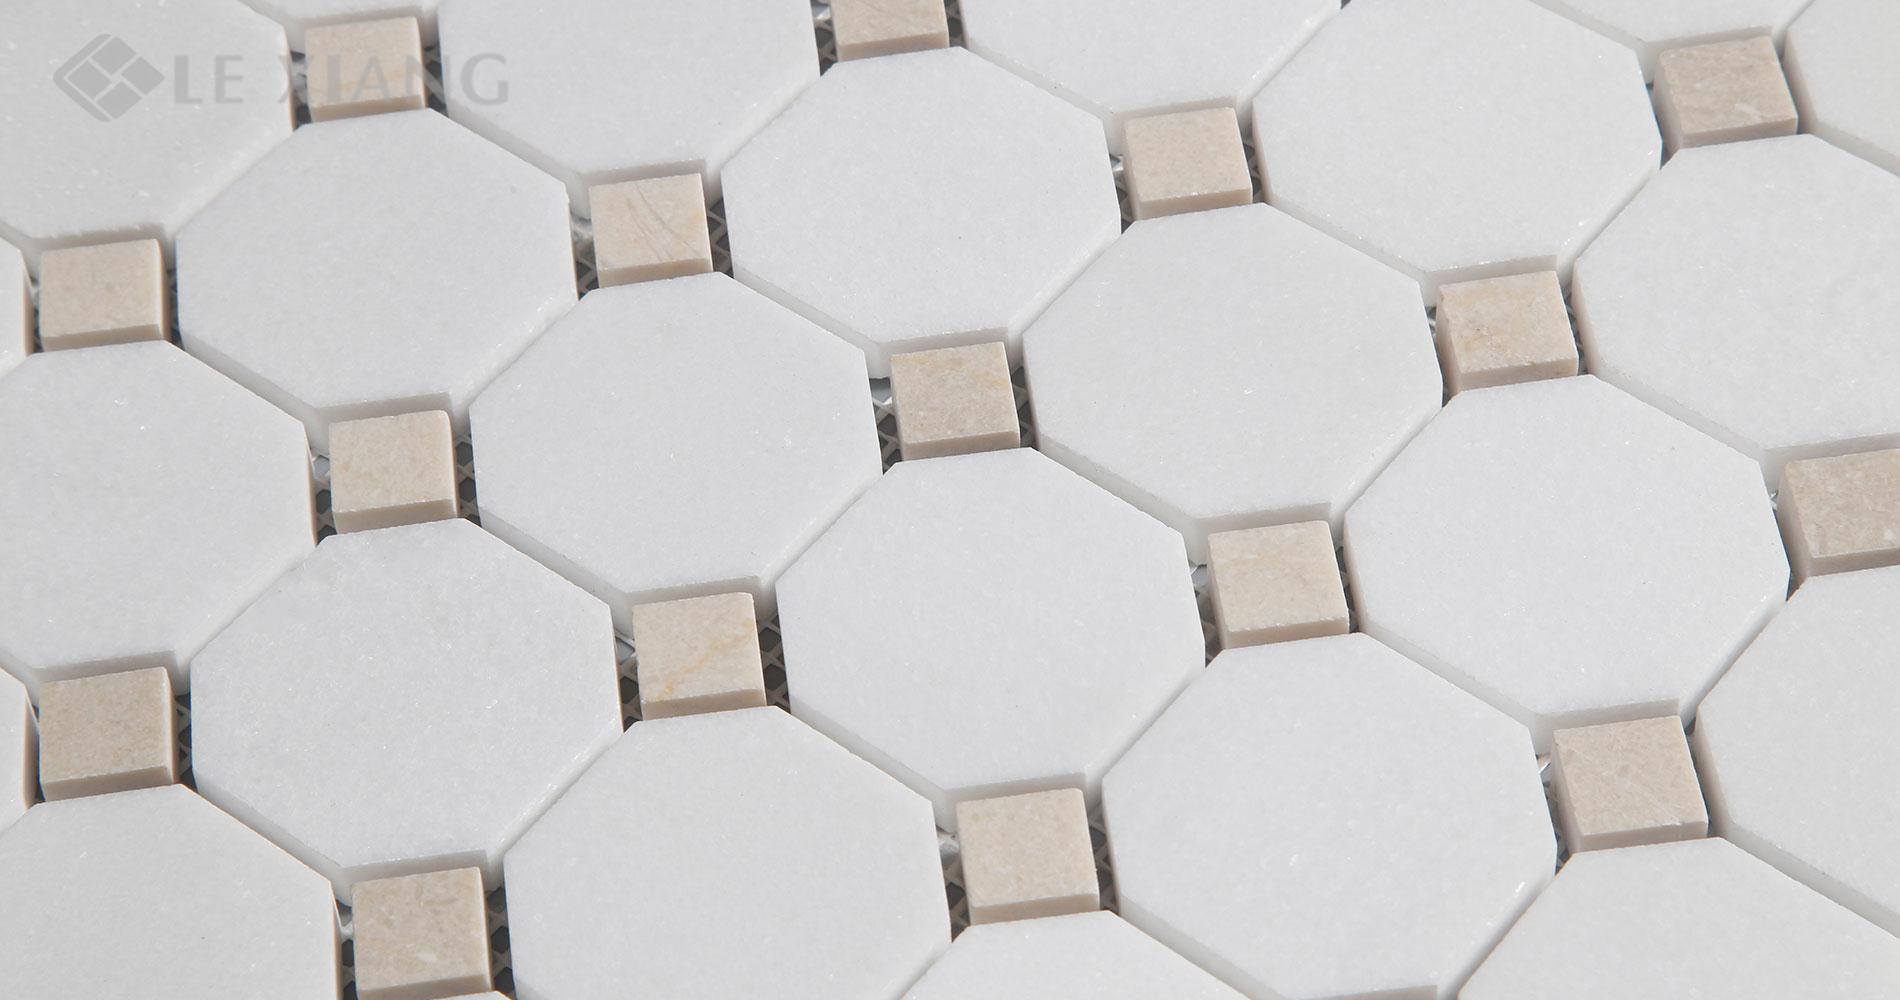 Marble-White-Thassos-Octagon-Mosaic-Tile-For-Kitchen-Backsplash-2